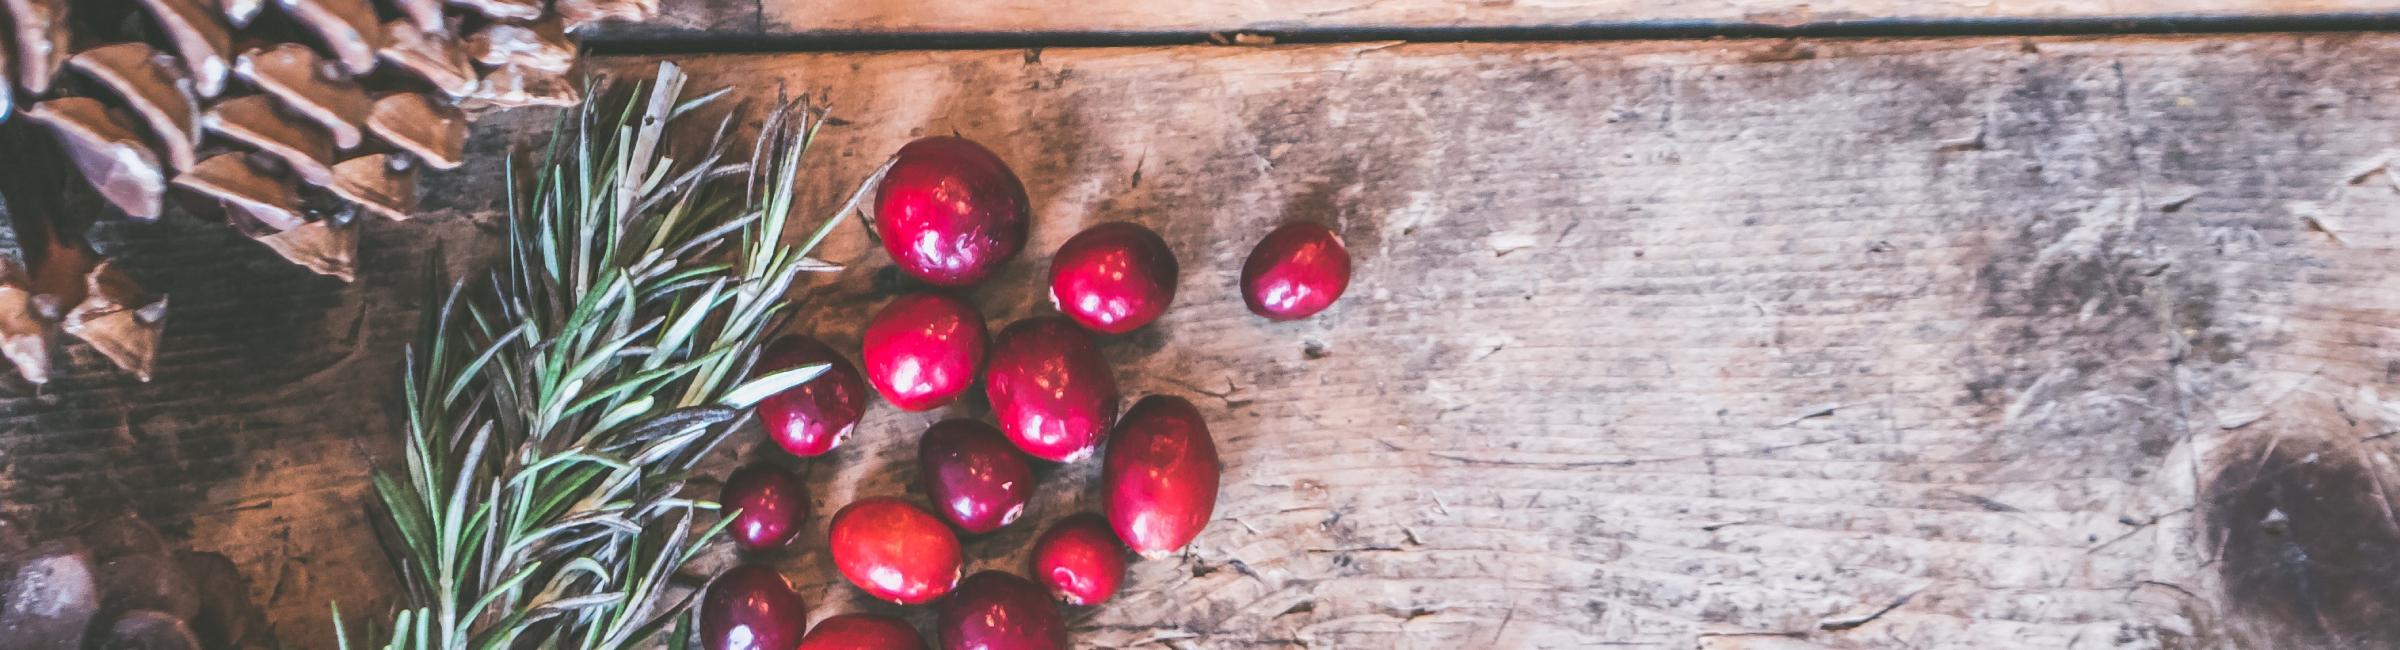 cranberries-pinecone-leaves